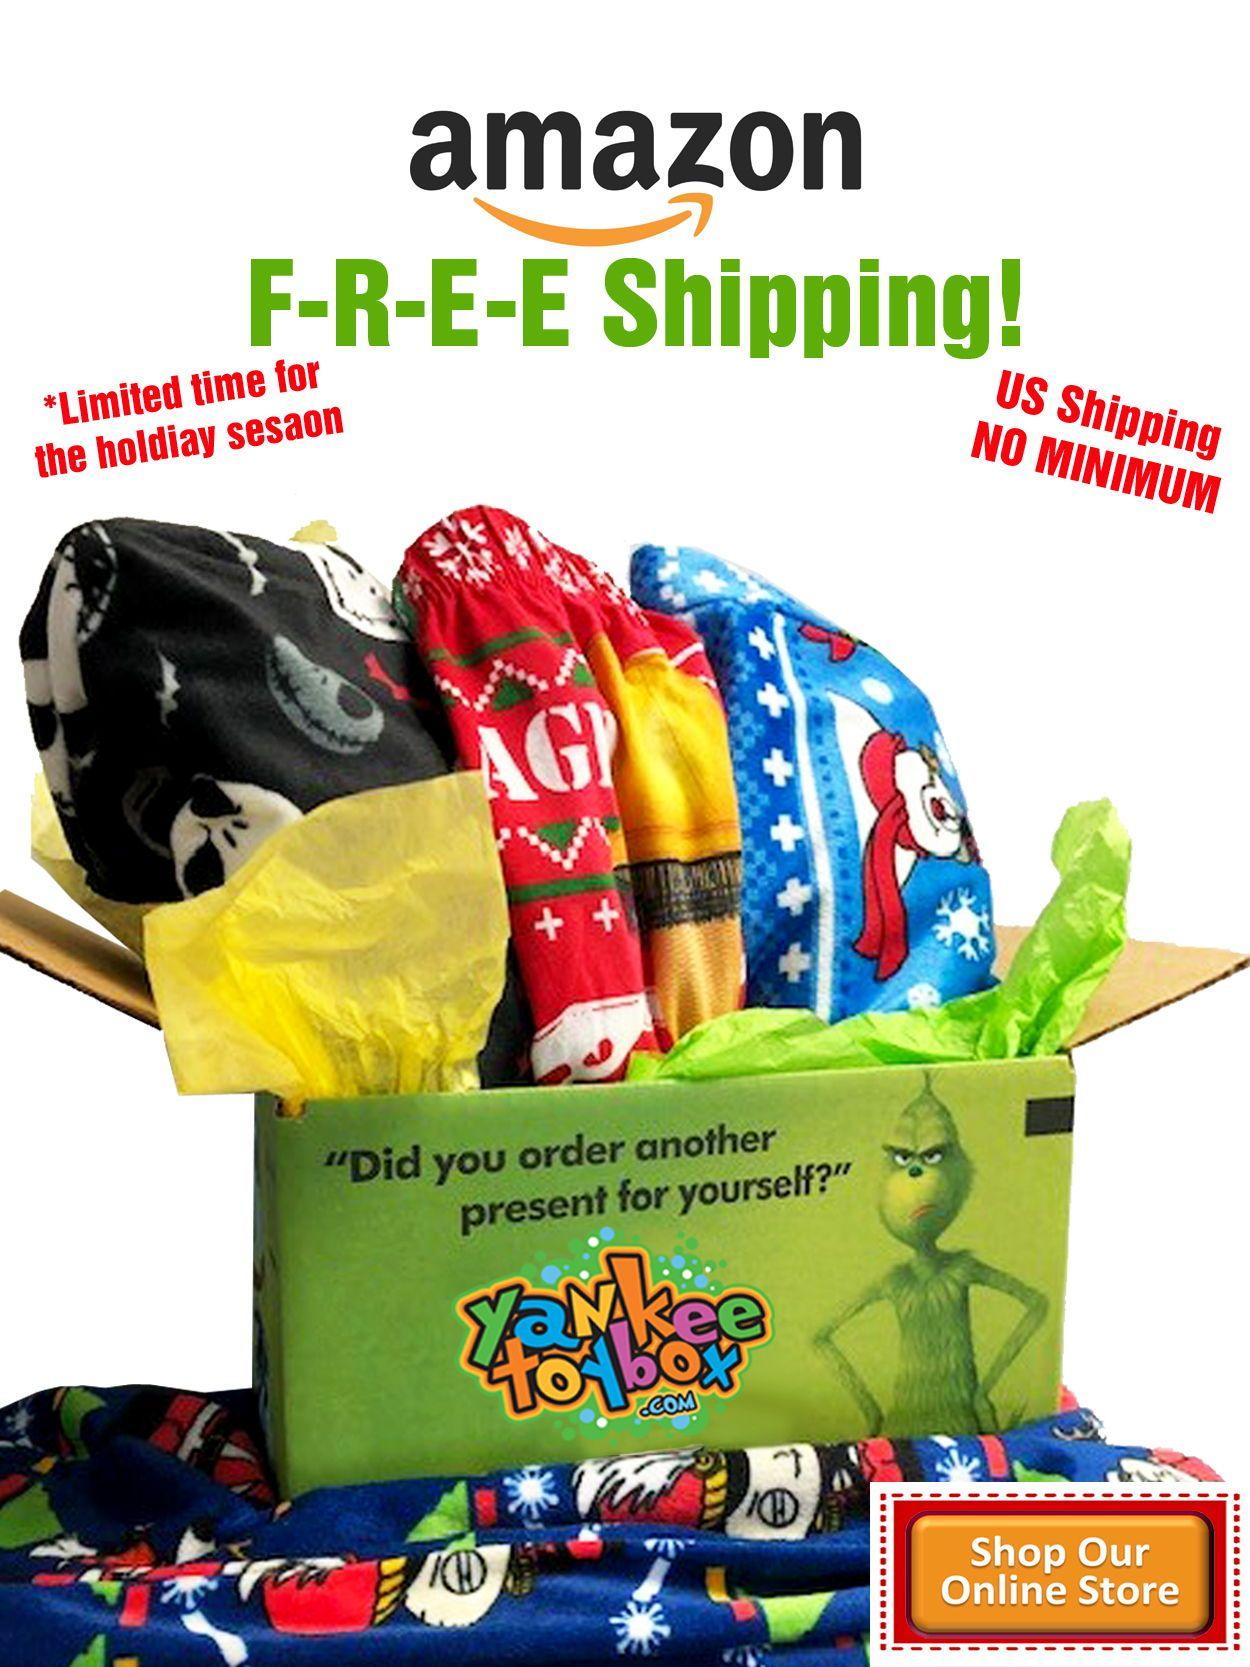 F-R-E-E Amazon SHIPPING! NO minimum purchase! No membership